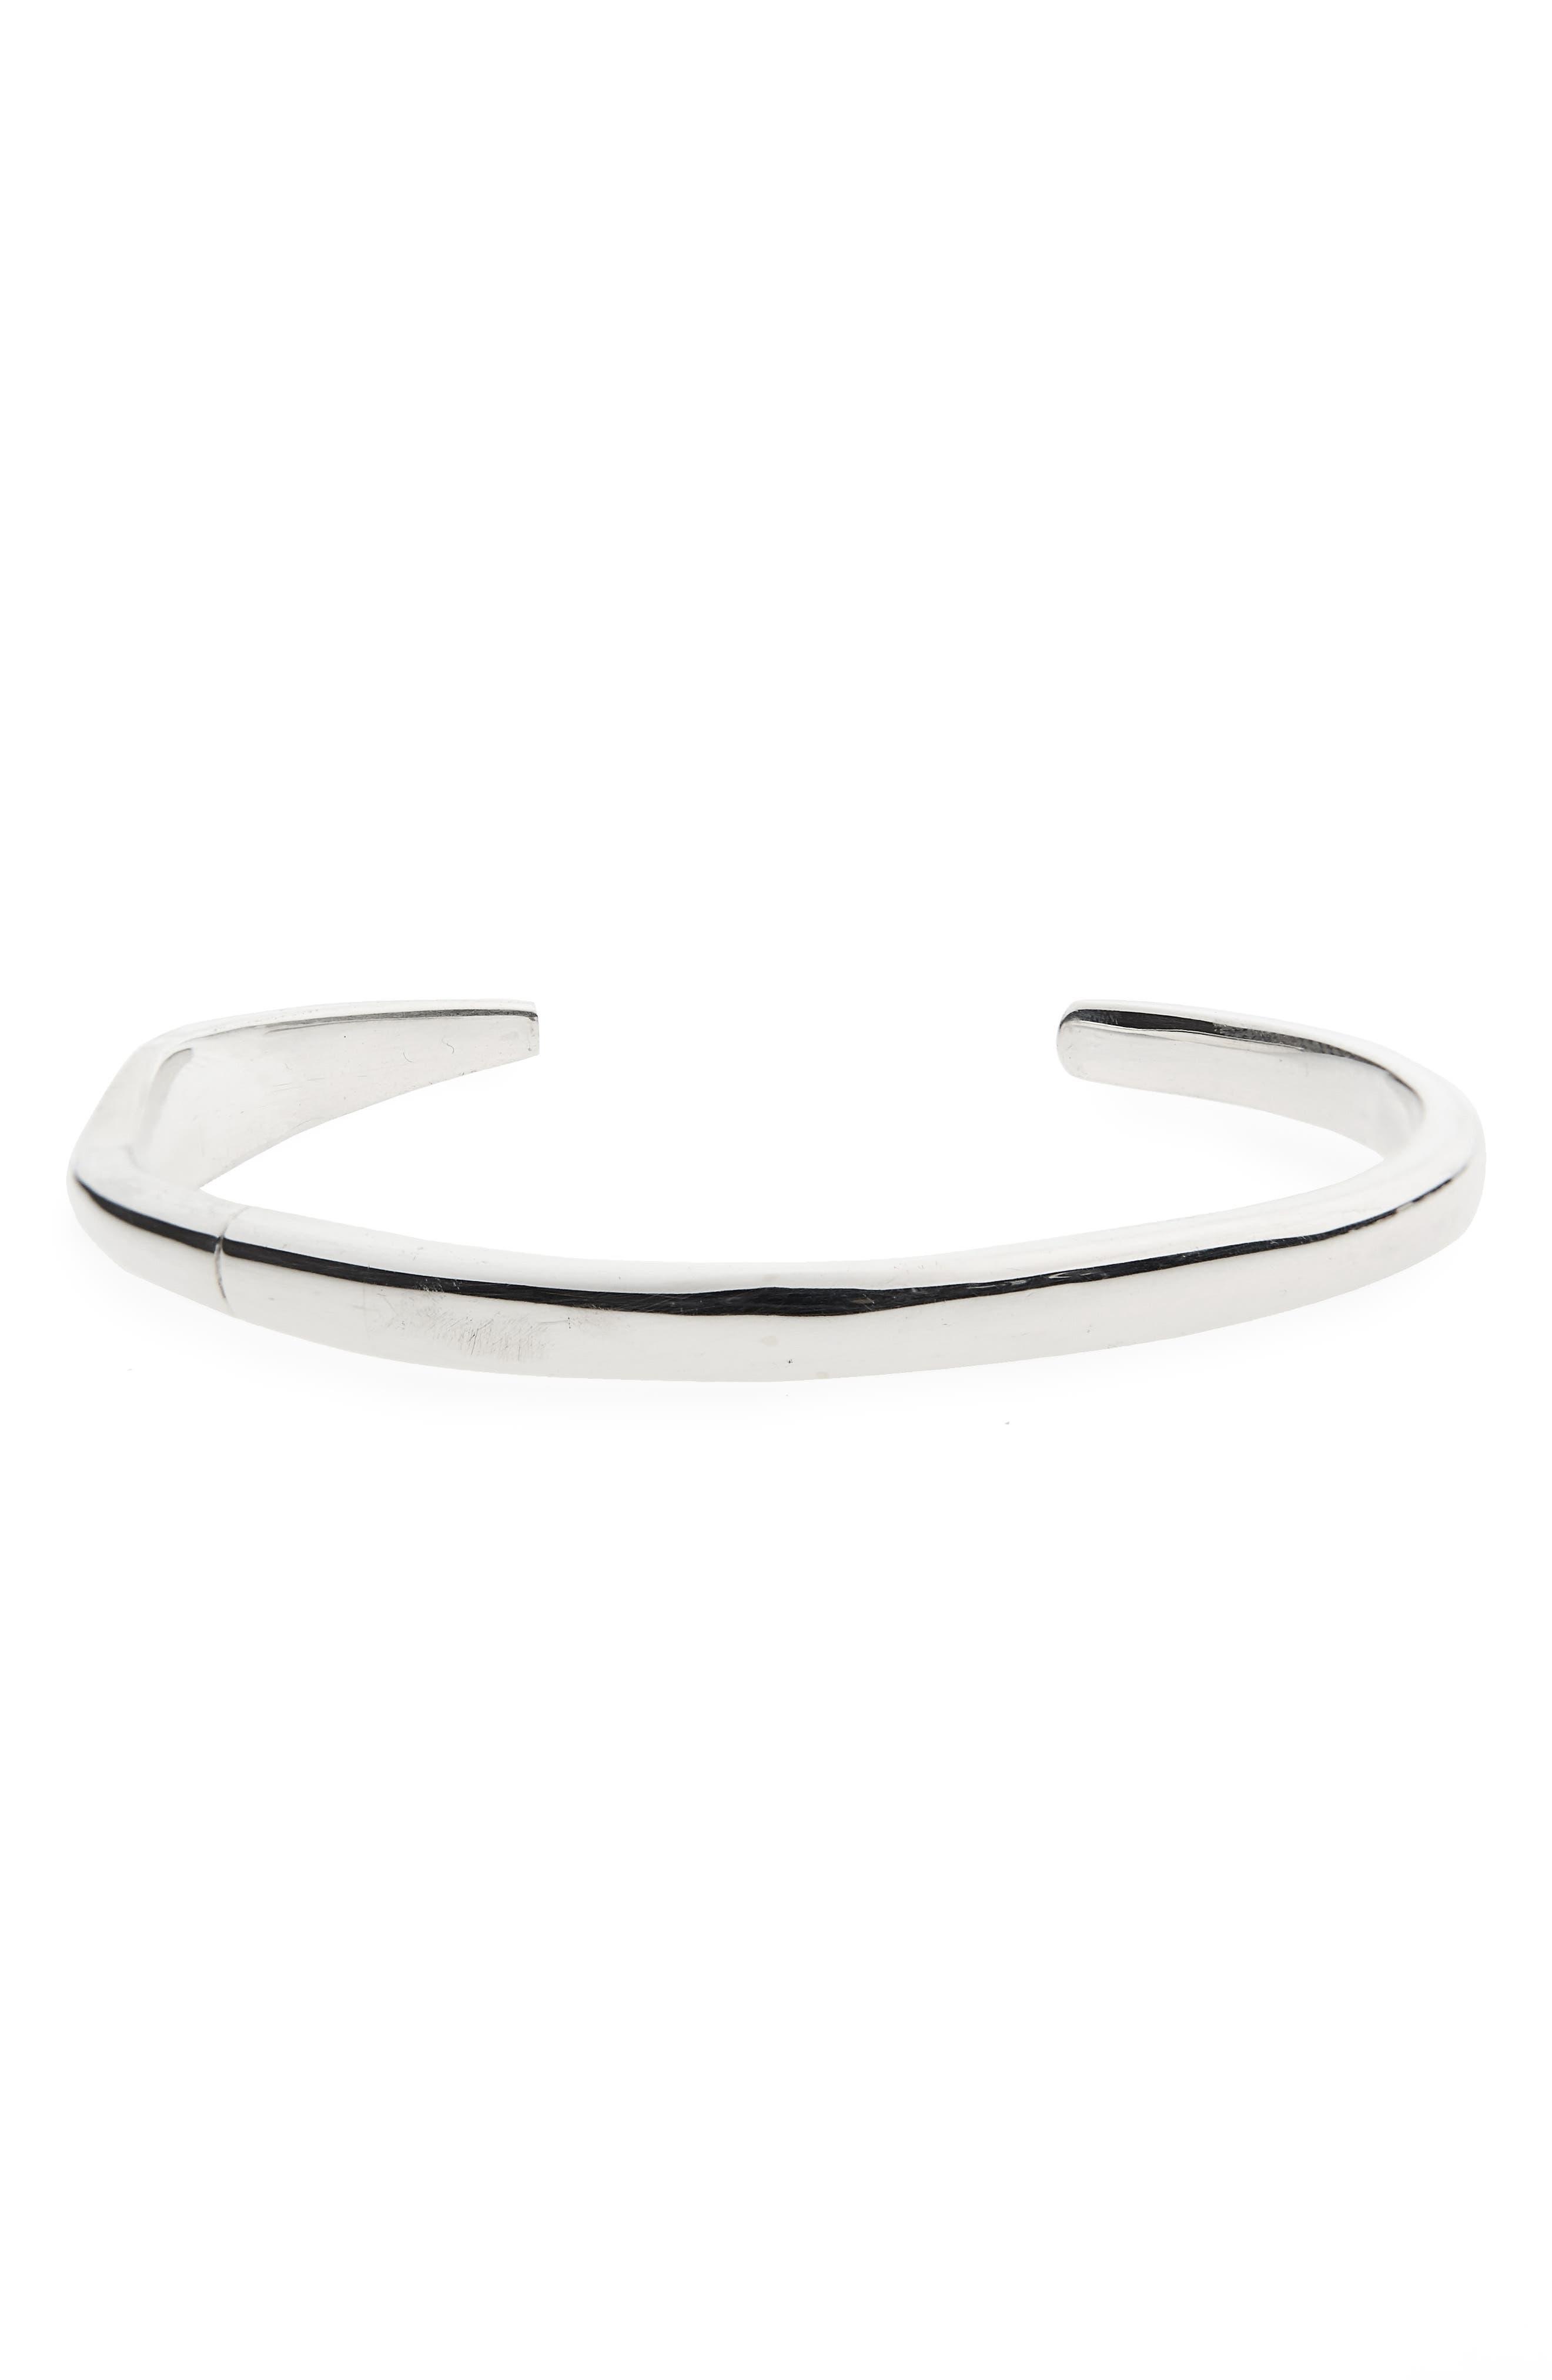 Fortitude Cuff Bracelet,                         Main,                         color, SILVER